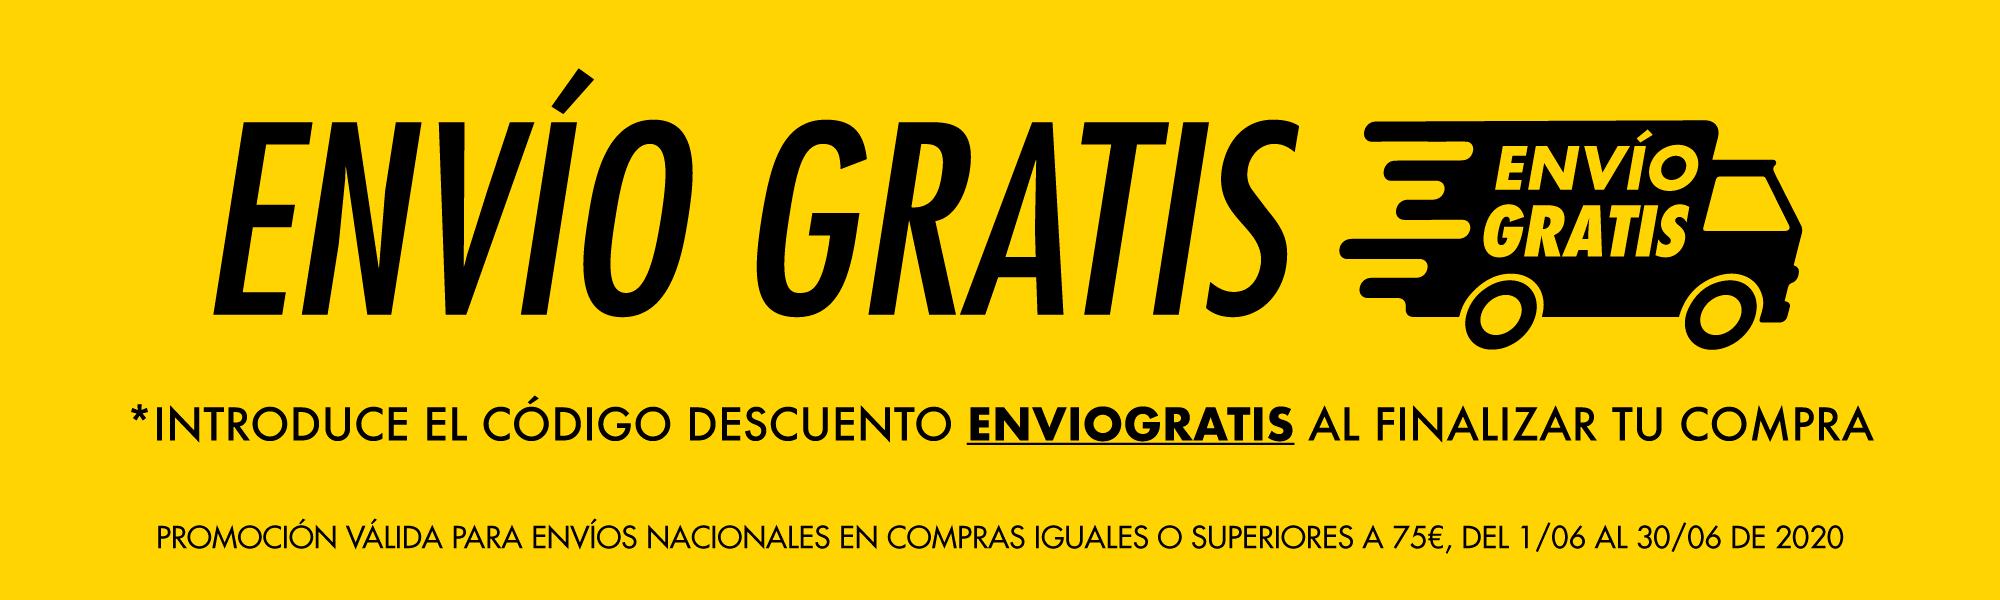 slide-envio-gratis-75-v2